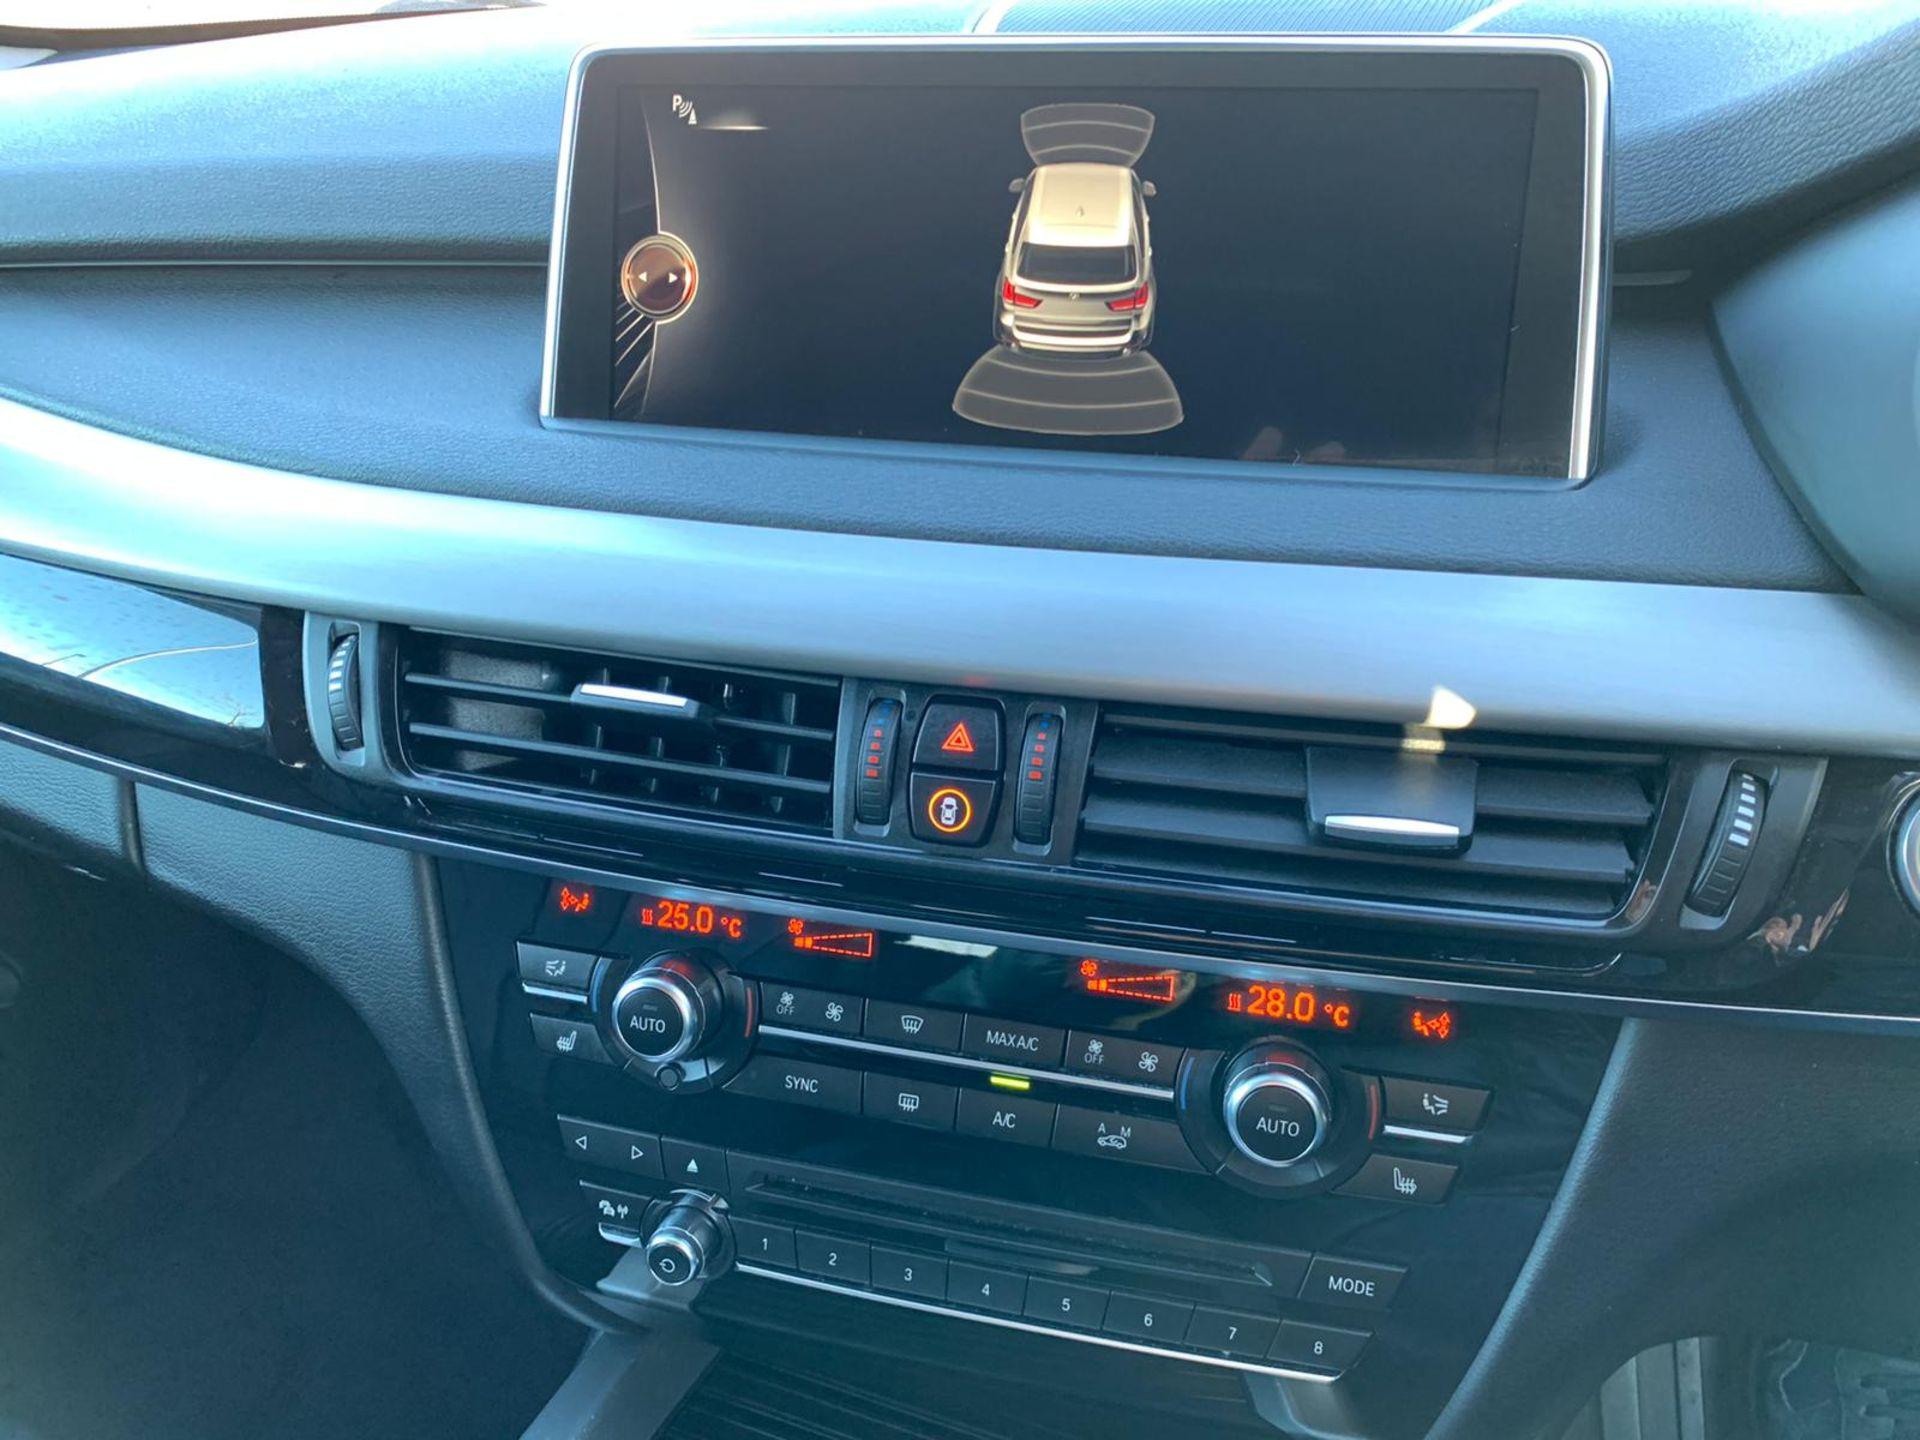 "(Reserve Met) BMW X5 2.0d S-DRIVE ""Special Equipment"" Auto- 7 Seater -16 Reg - Sat Nav- (New Shape) - Image 37 of 43"